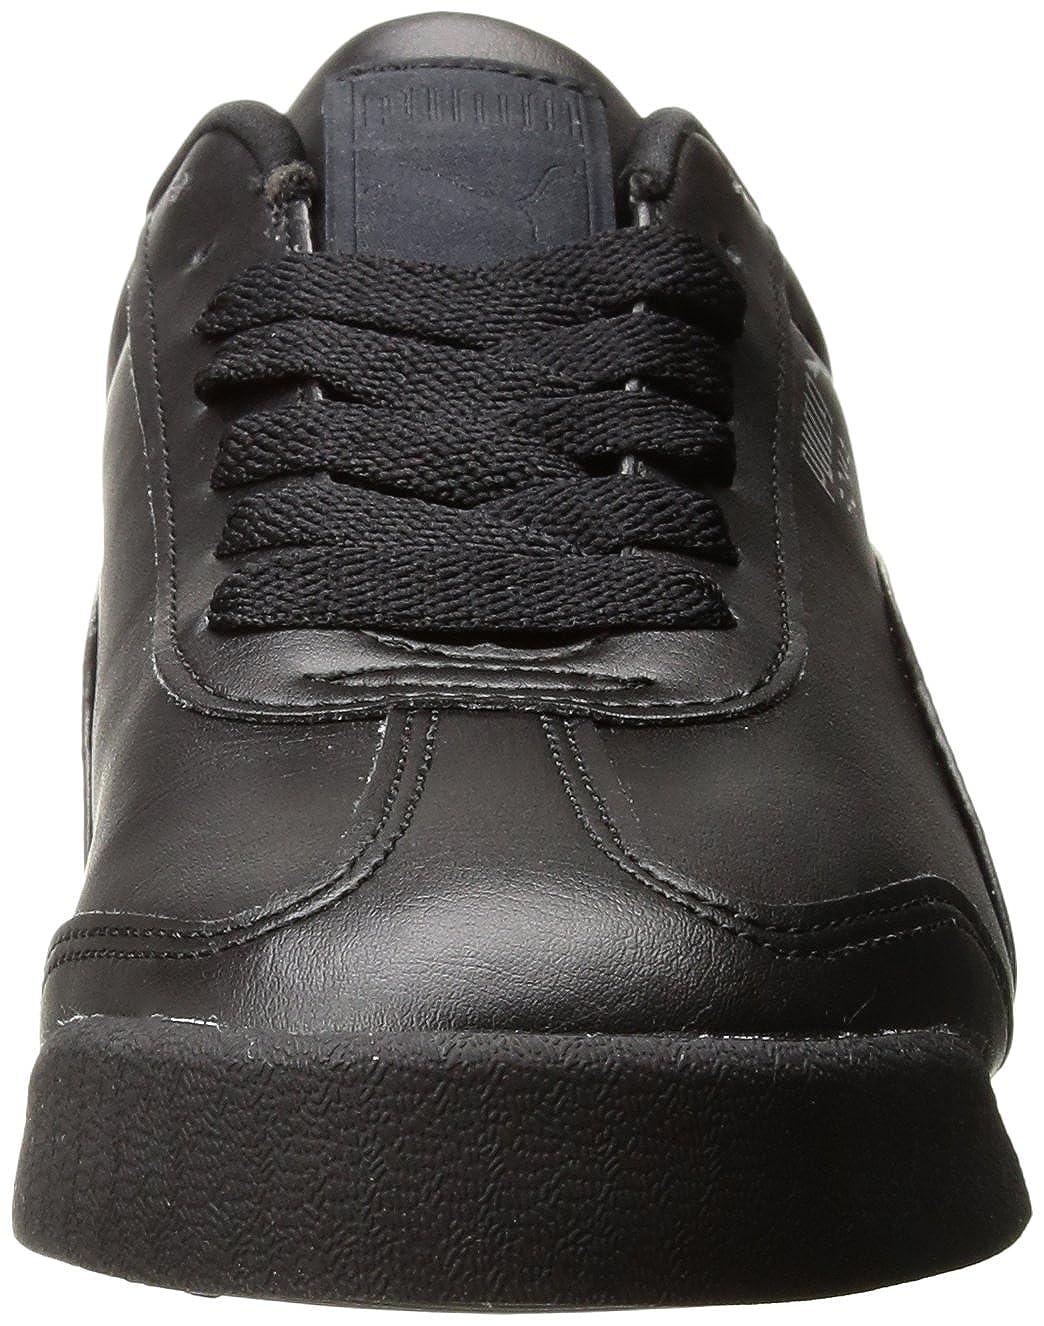 9fe62d872 Amazon.com: PUMA Men's Roma Basic Sneaker: Puma: Shoes